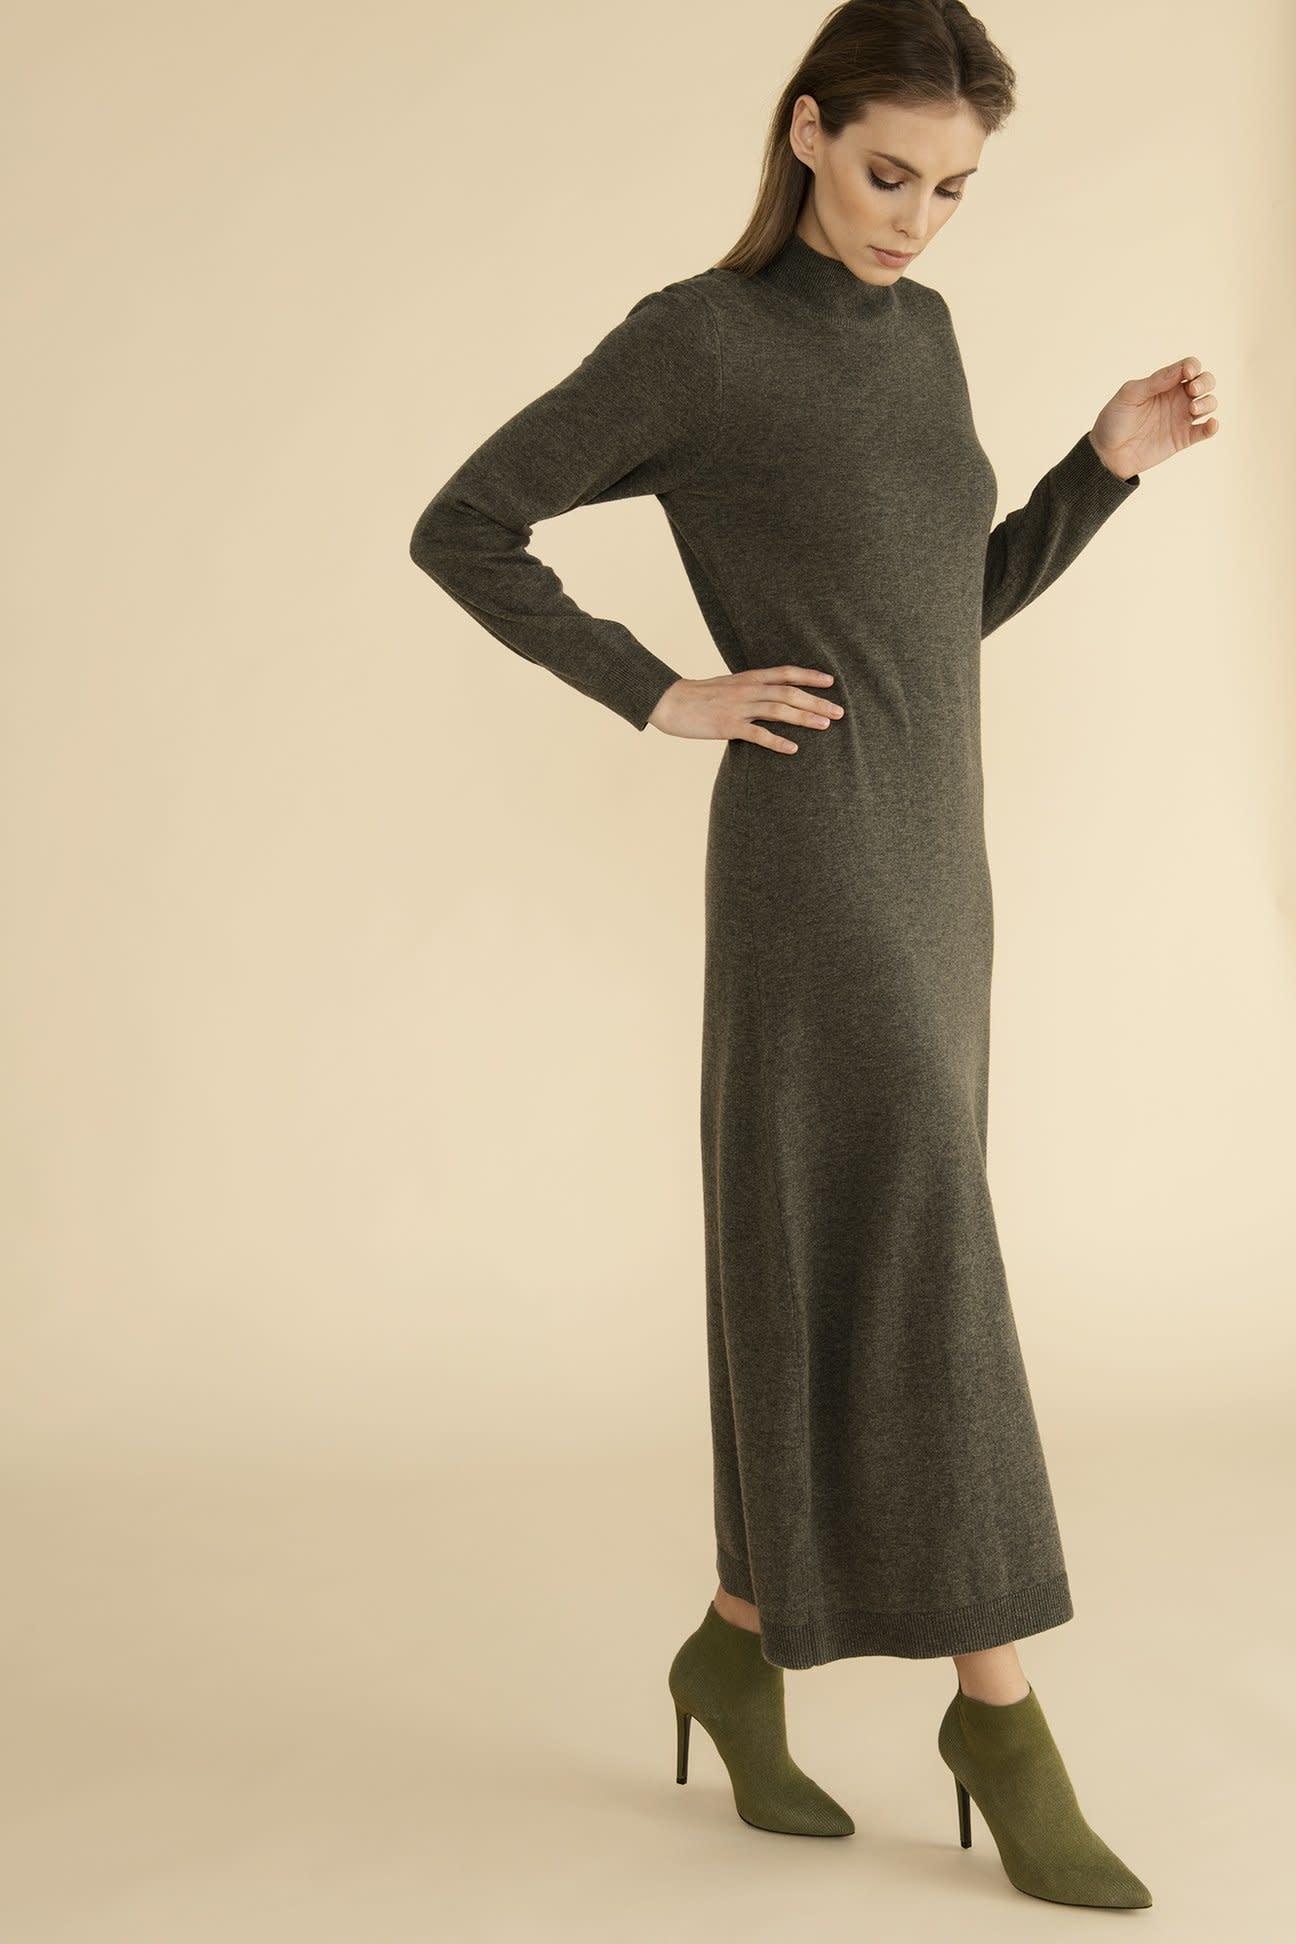 Iris dress Oscar-3